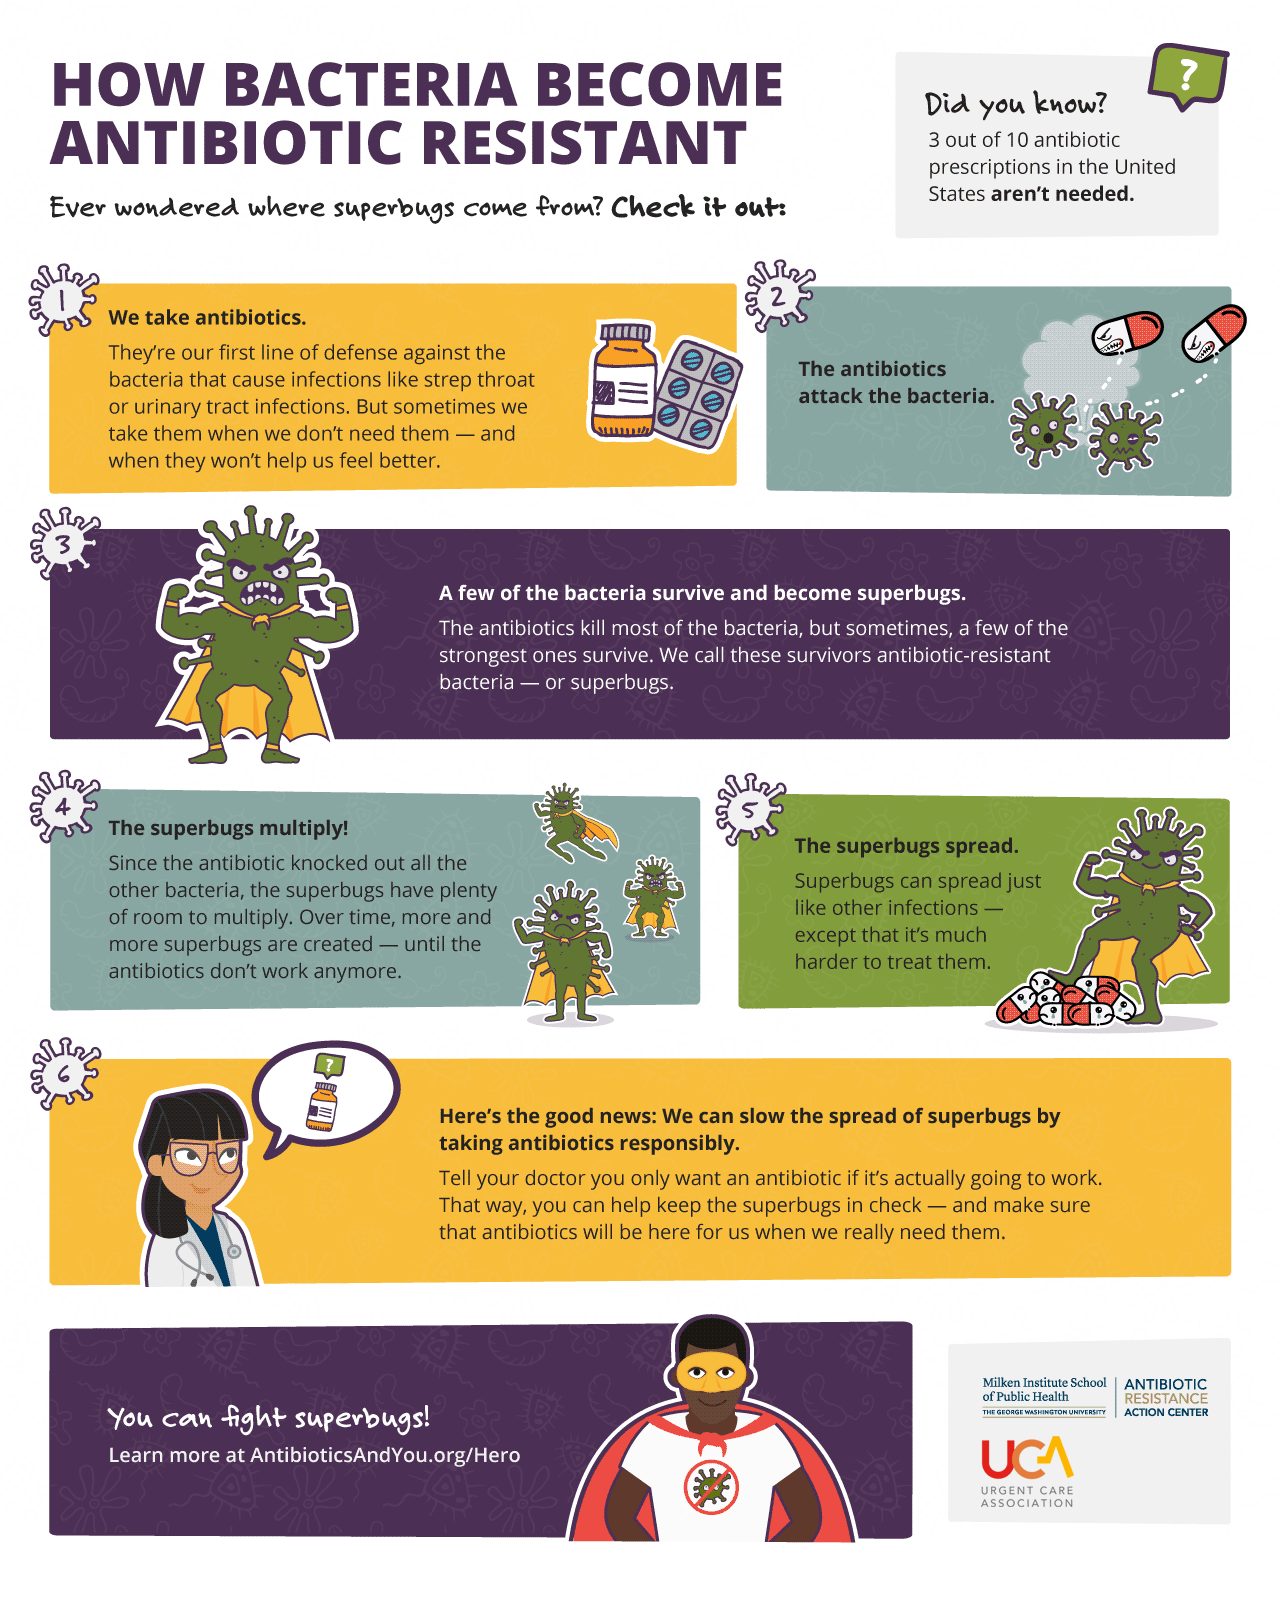 How Bacteria Become Antibiotic Resistant. Full description below